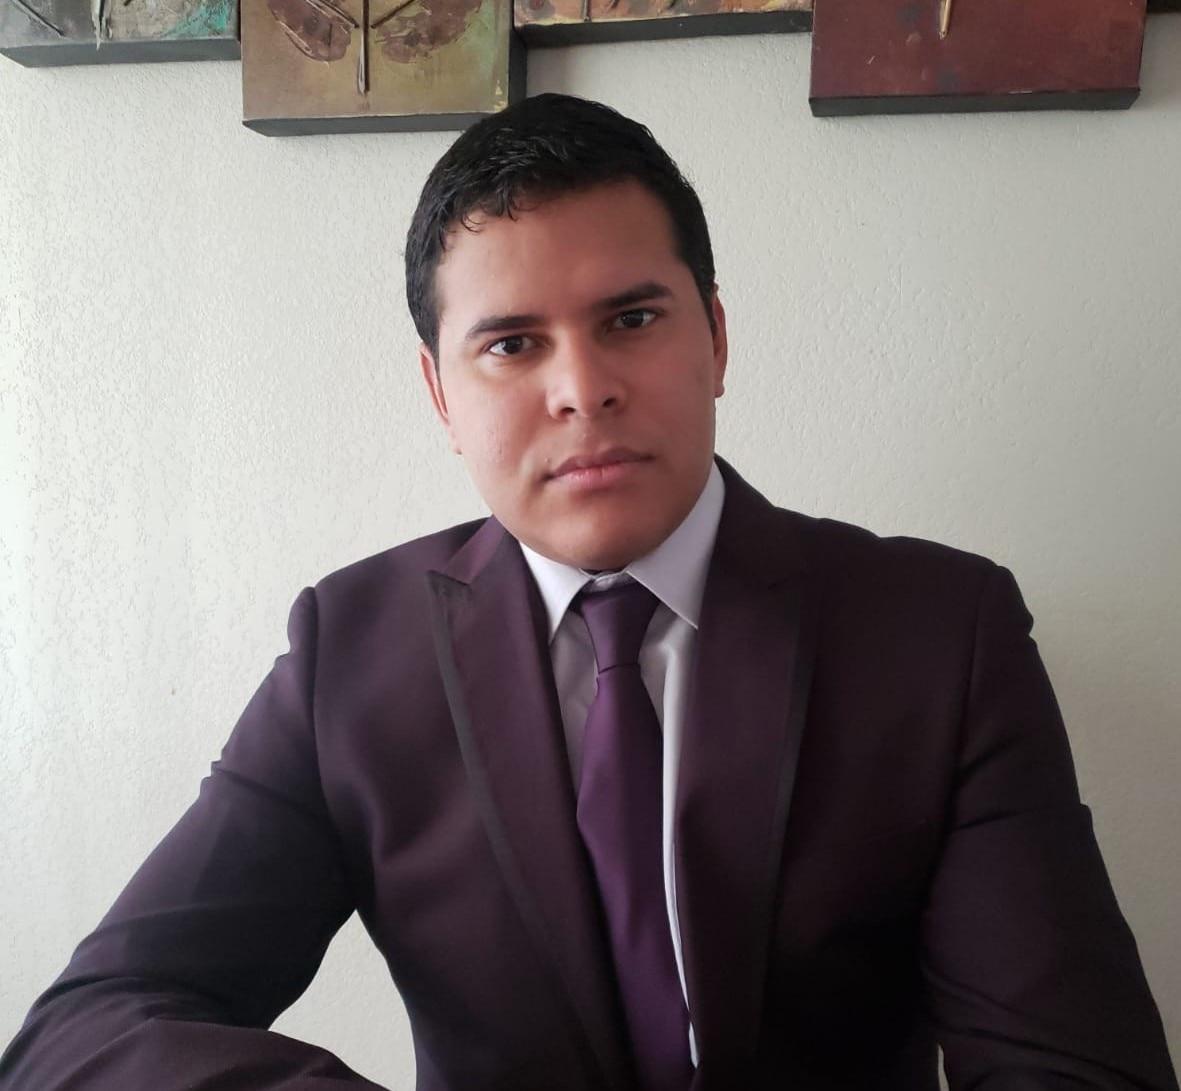 DANIEL ANDRES APONTE CONTRERAS  Your Financial Professional & Insurance Agent